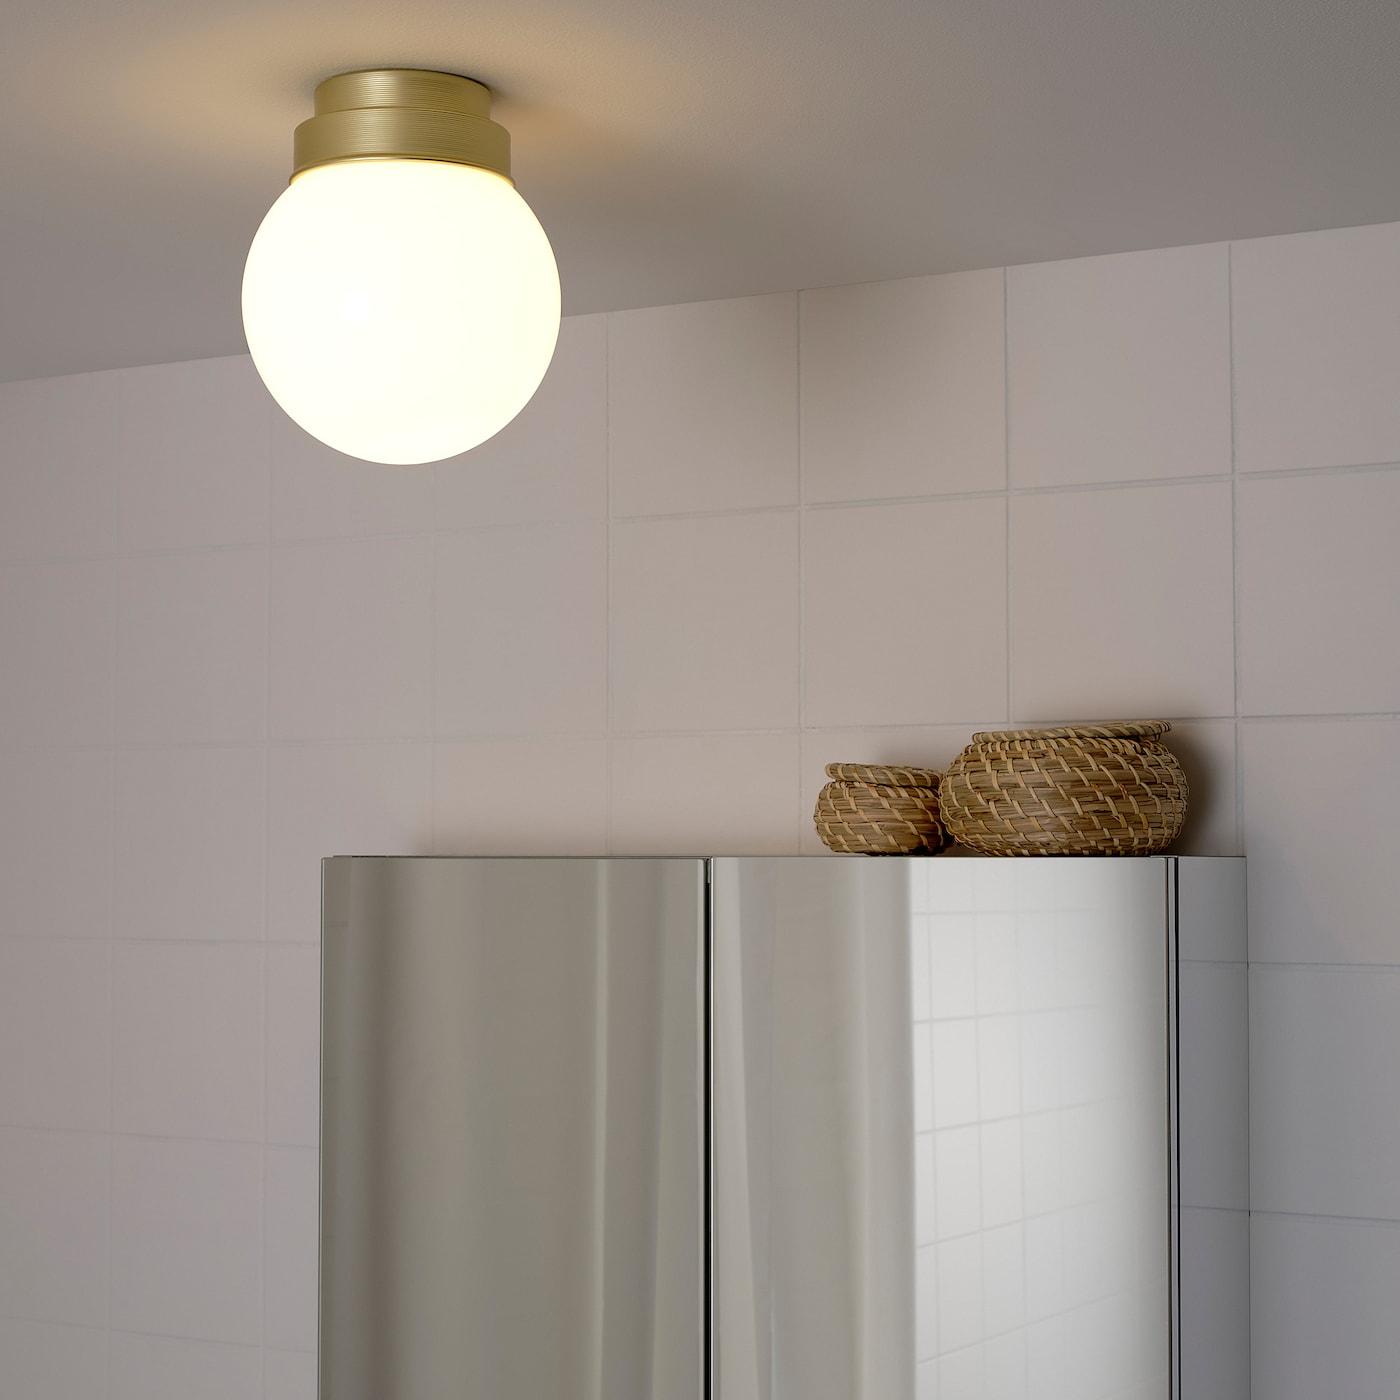 Perfect Plafonnier Salle De Bains Ikea